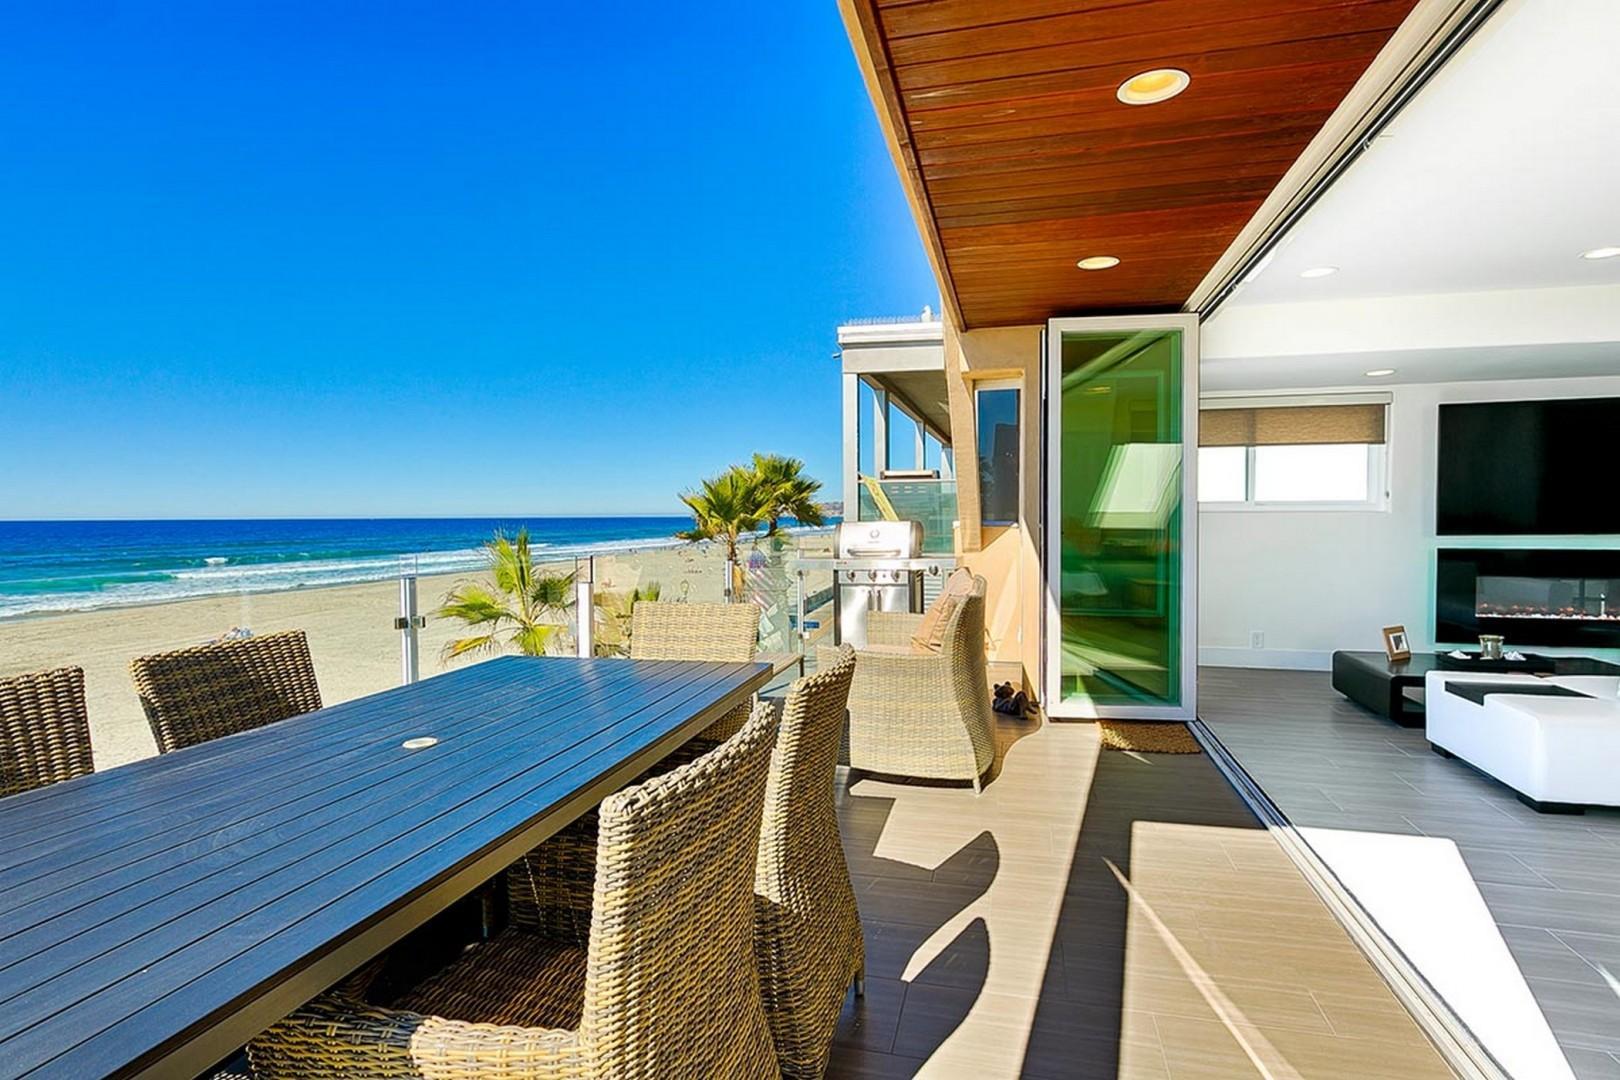 B5288 Pacific Dream Penthouse